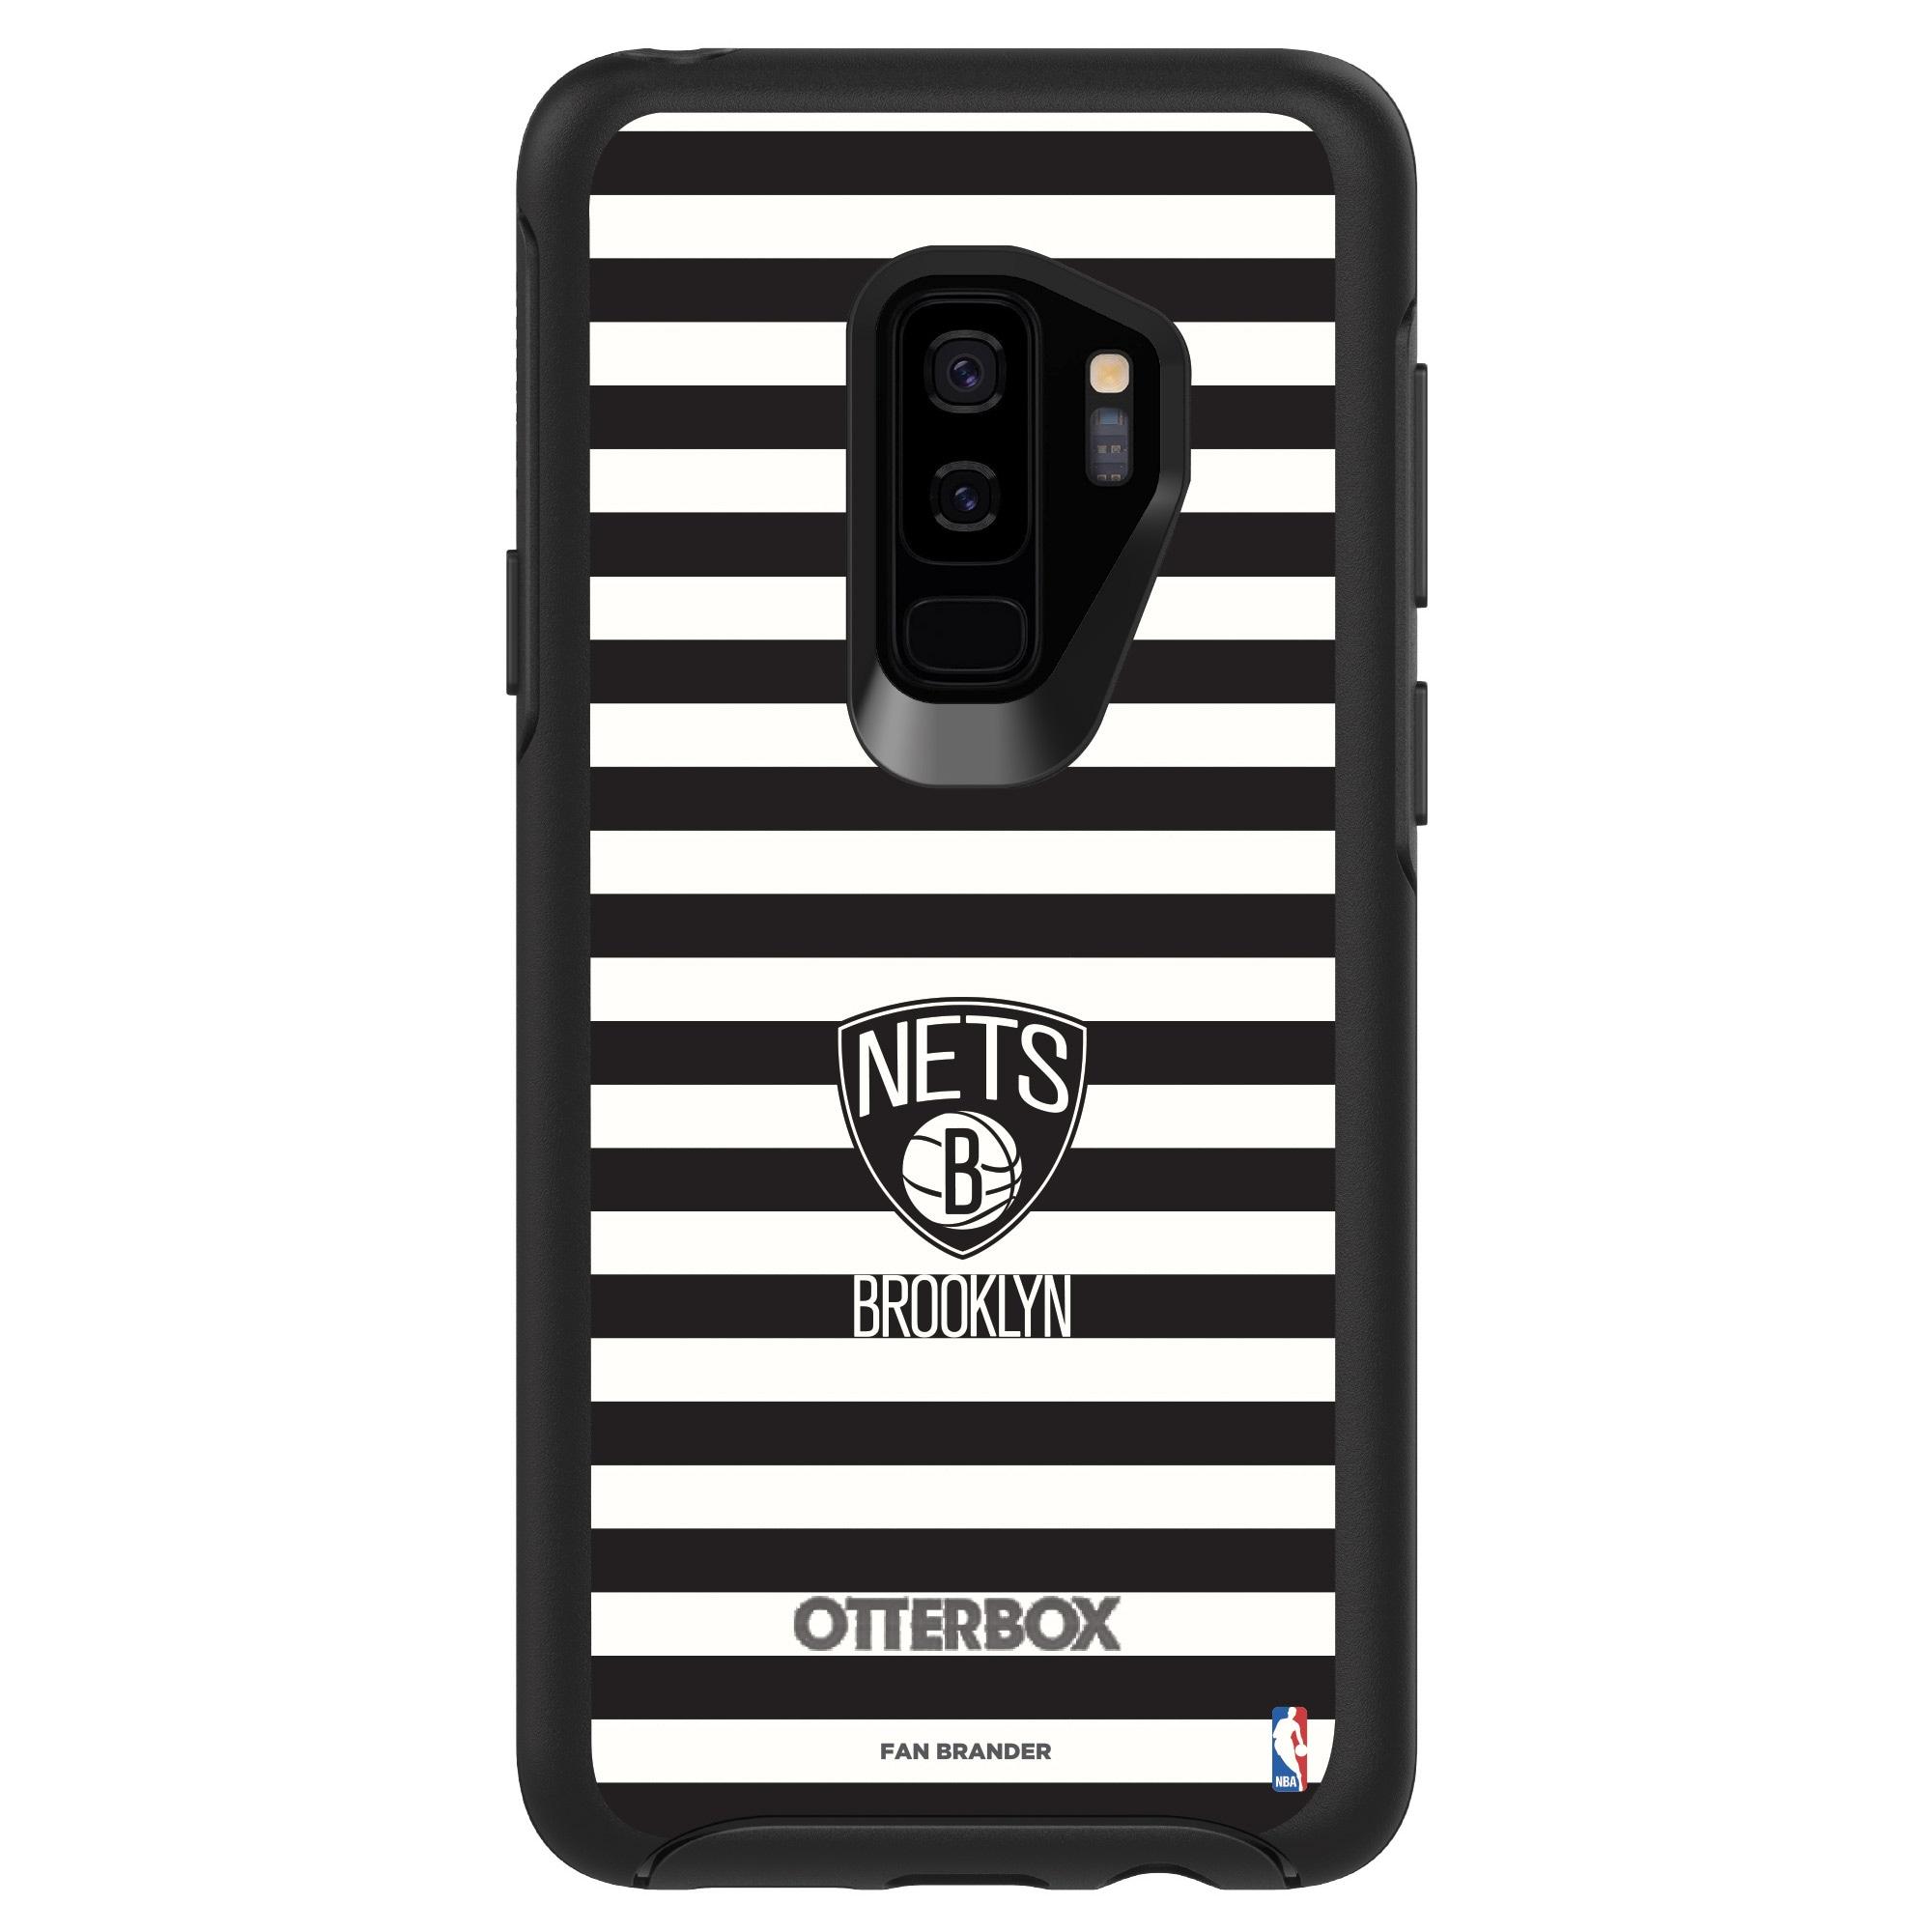 Brooklyn Nets OtterBox Galaxy Symmetry Striped Design Case